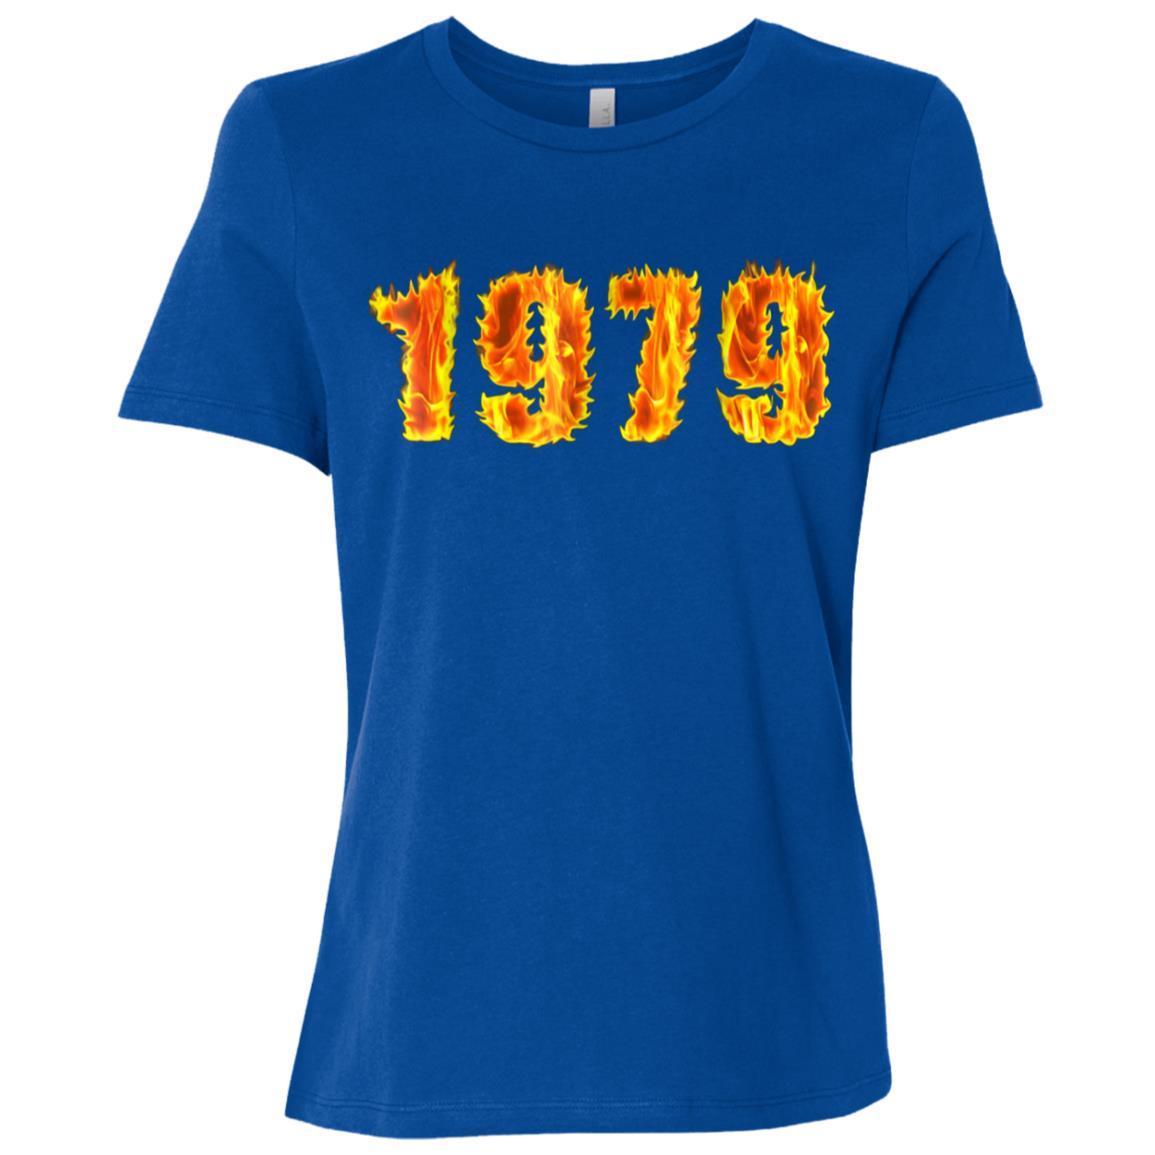 CuteCompystyle 39th Birthday Gift Vintage 1979 Women Short Sleeve T-Shirt